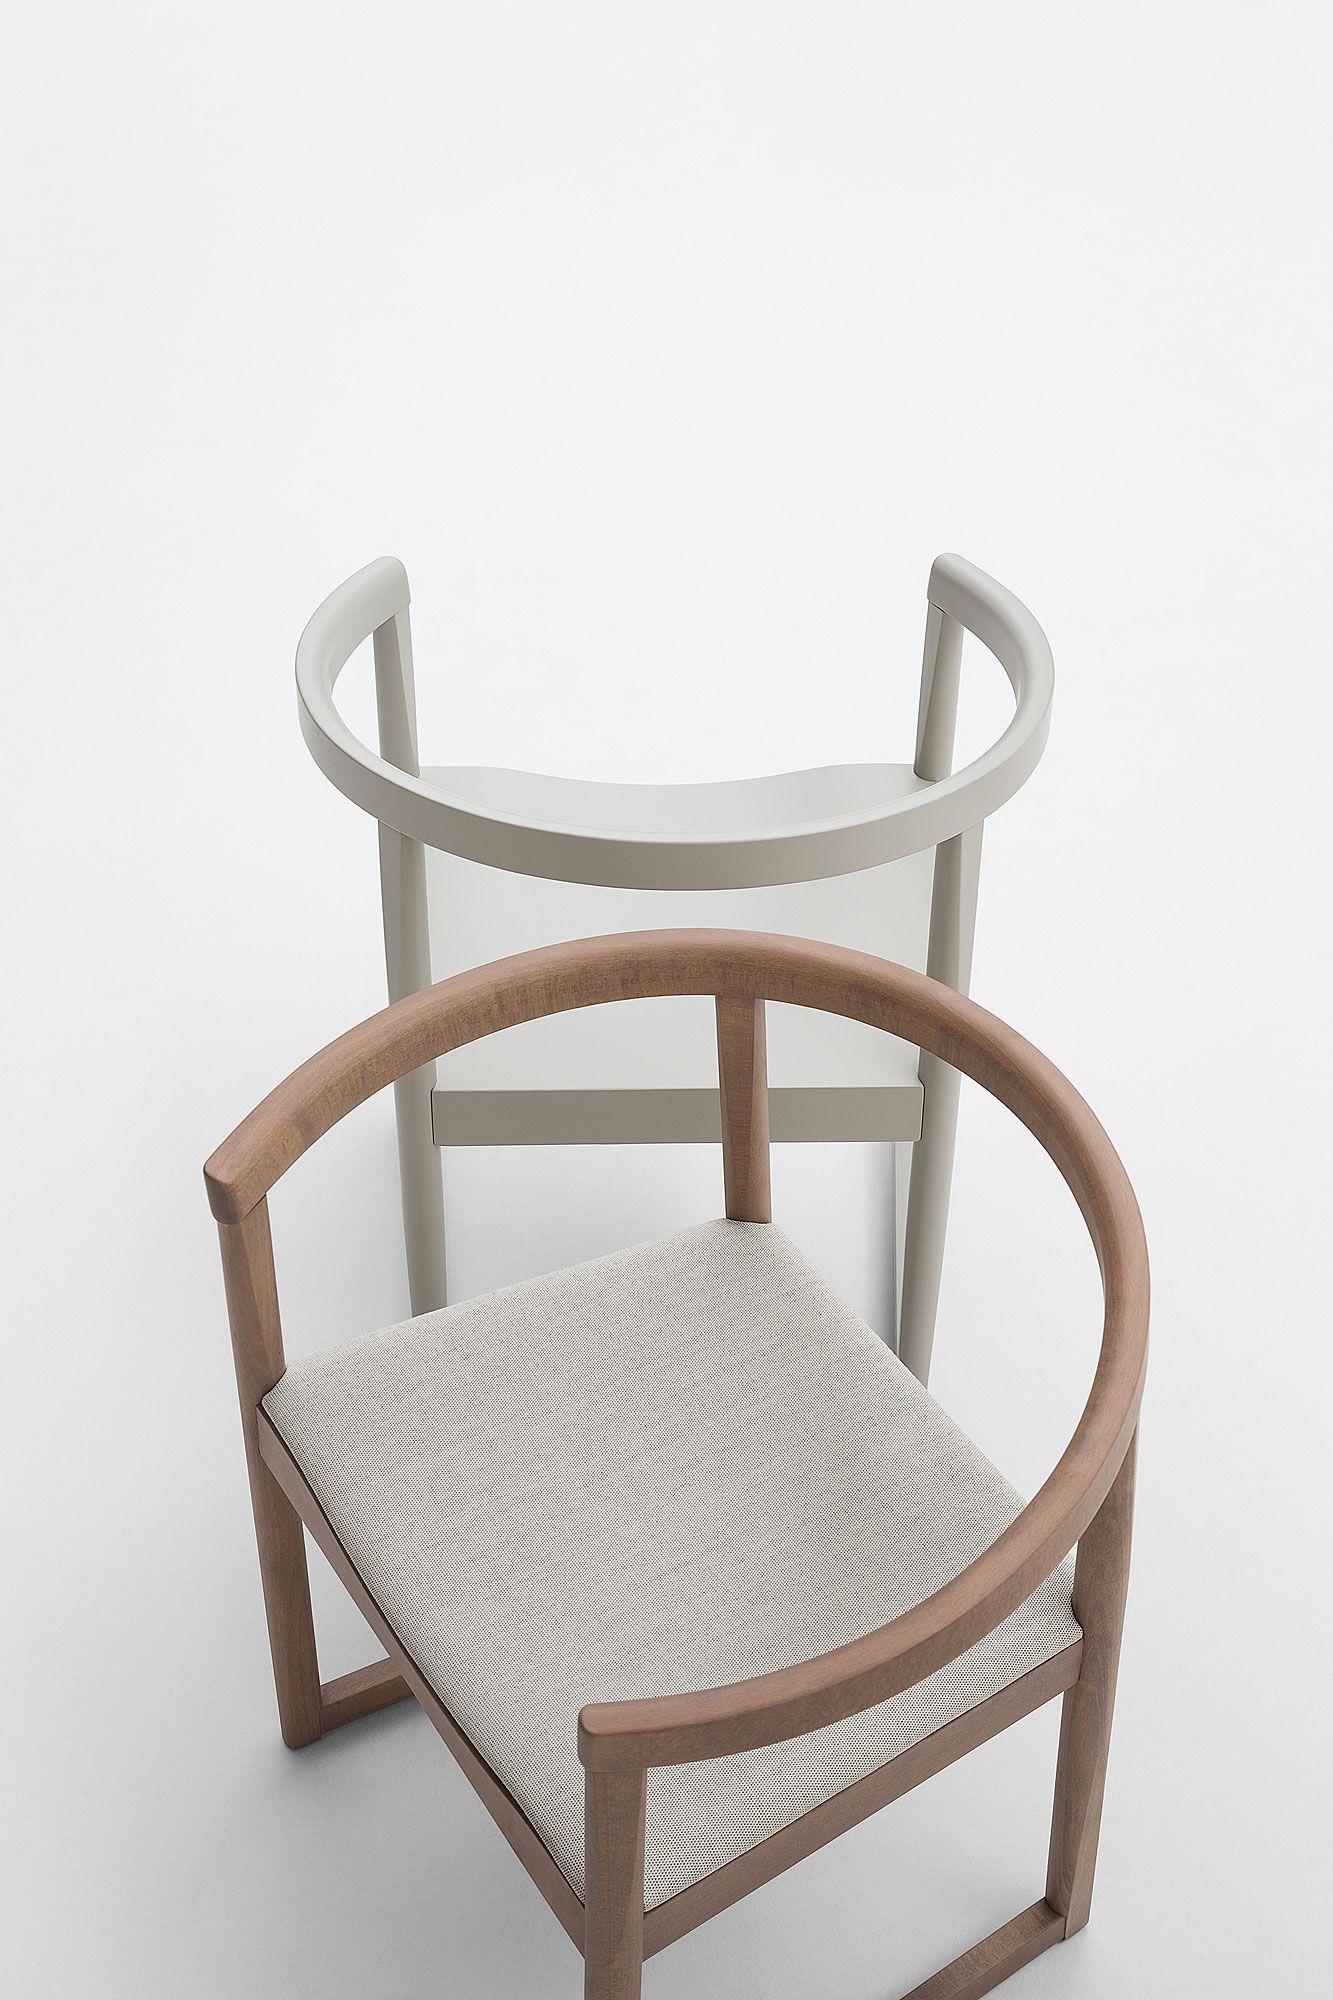 Nordica Sedia legno design, Sedie dipinte, Design del